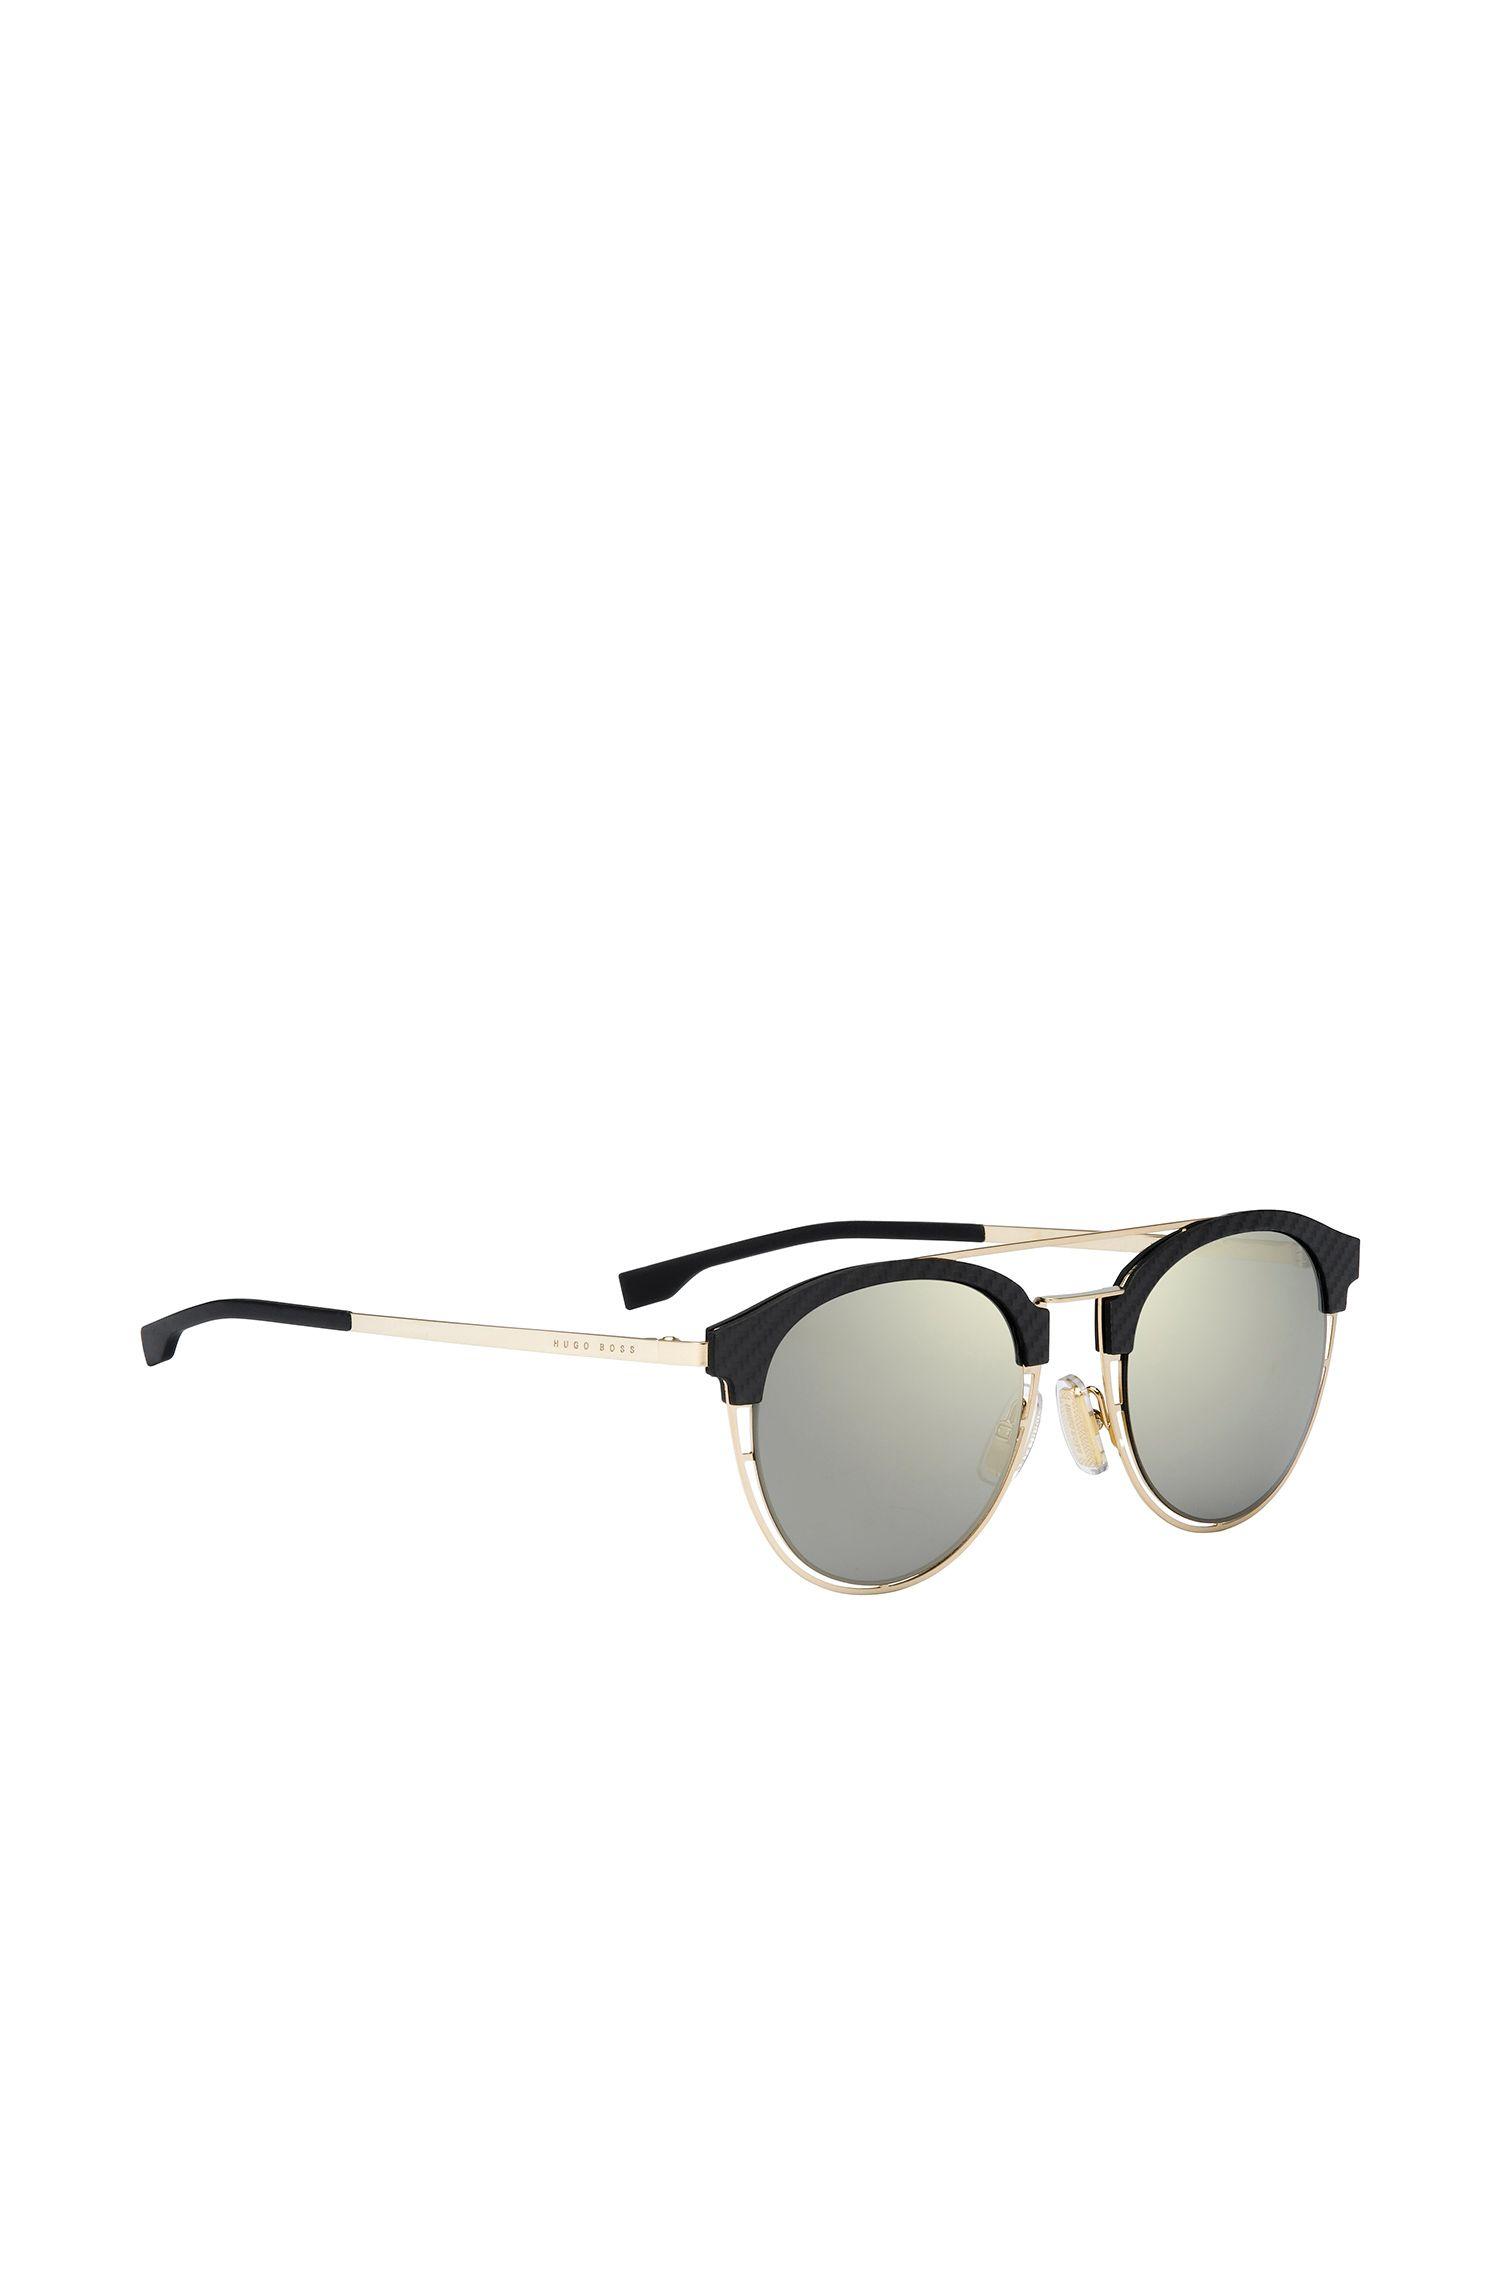 Grey Bronze Lens Clubmaster Sunglasses | BOSS 0784S